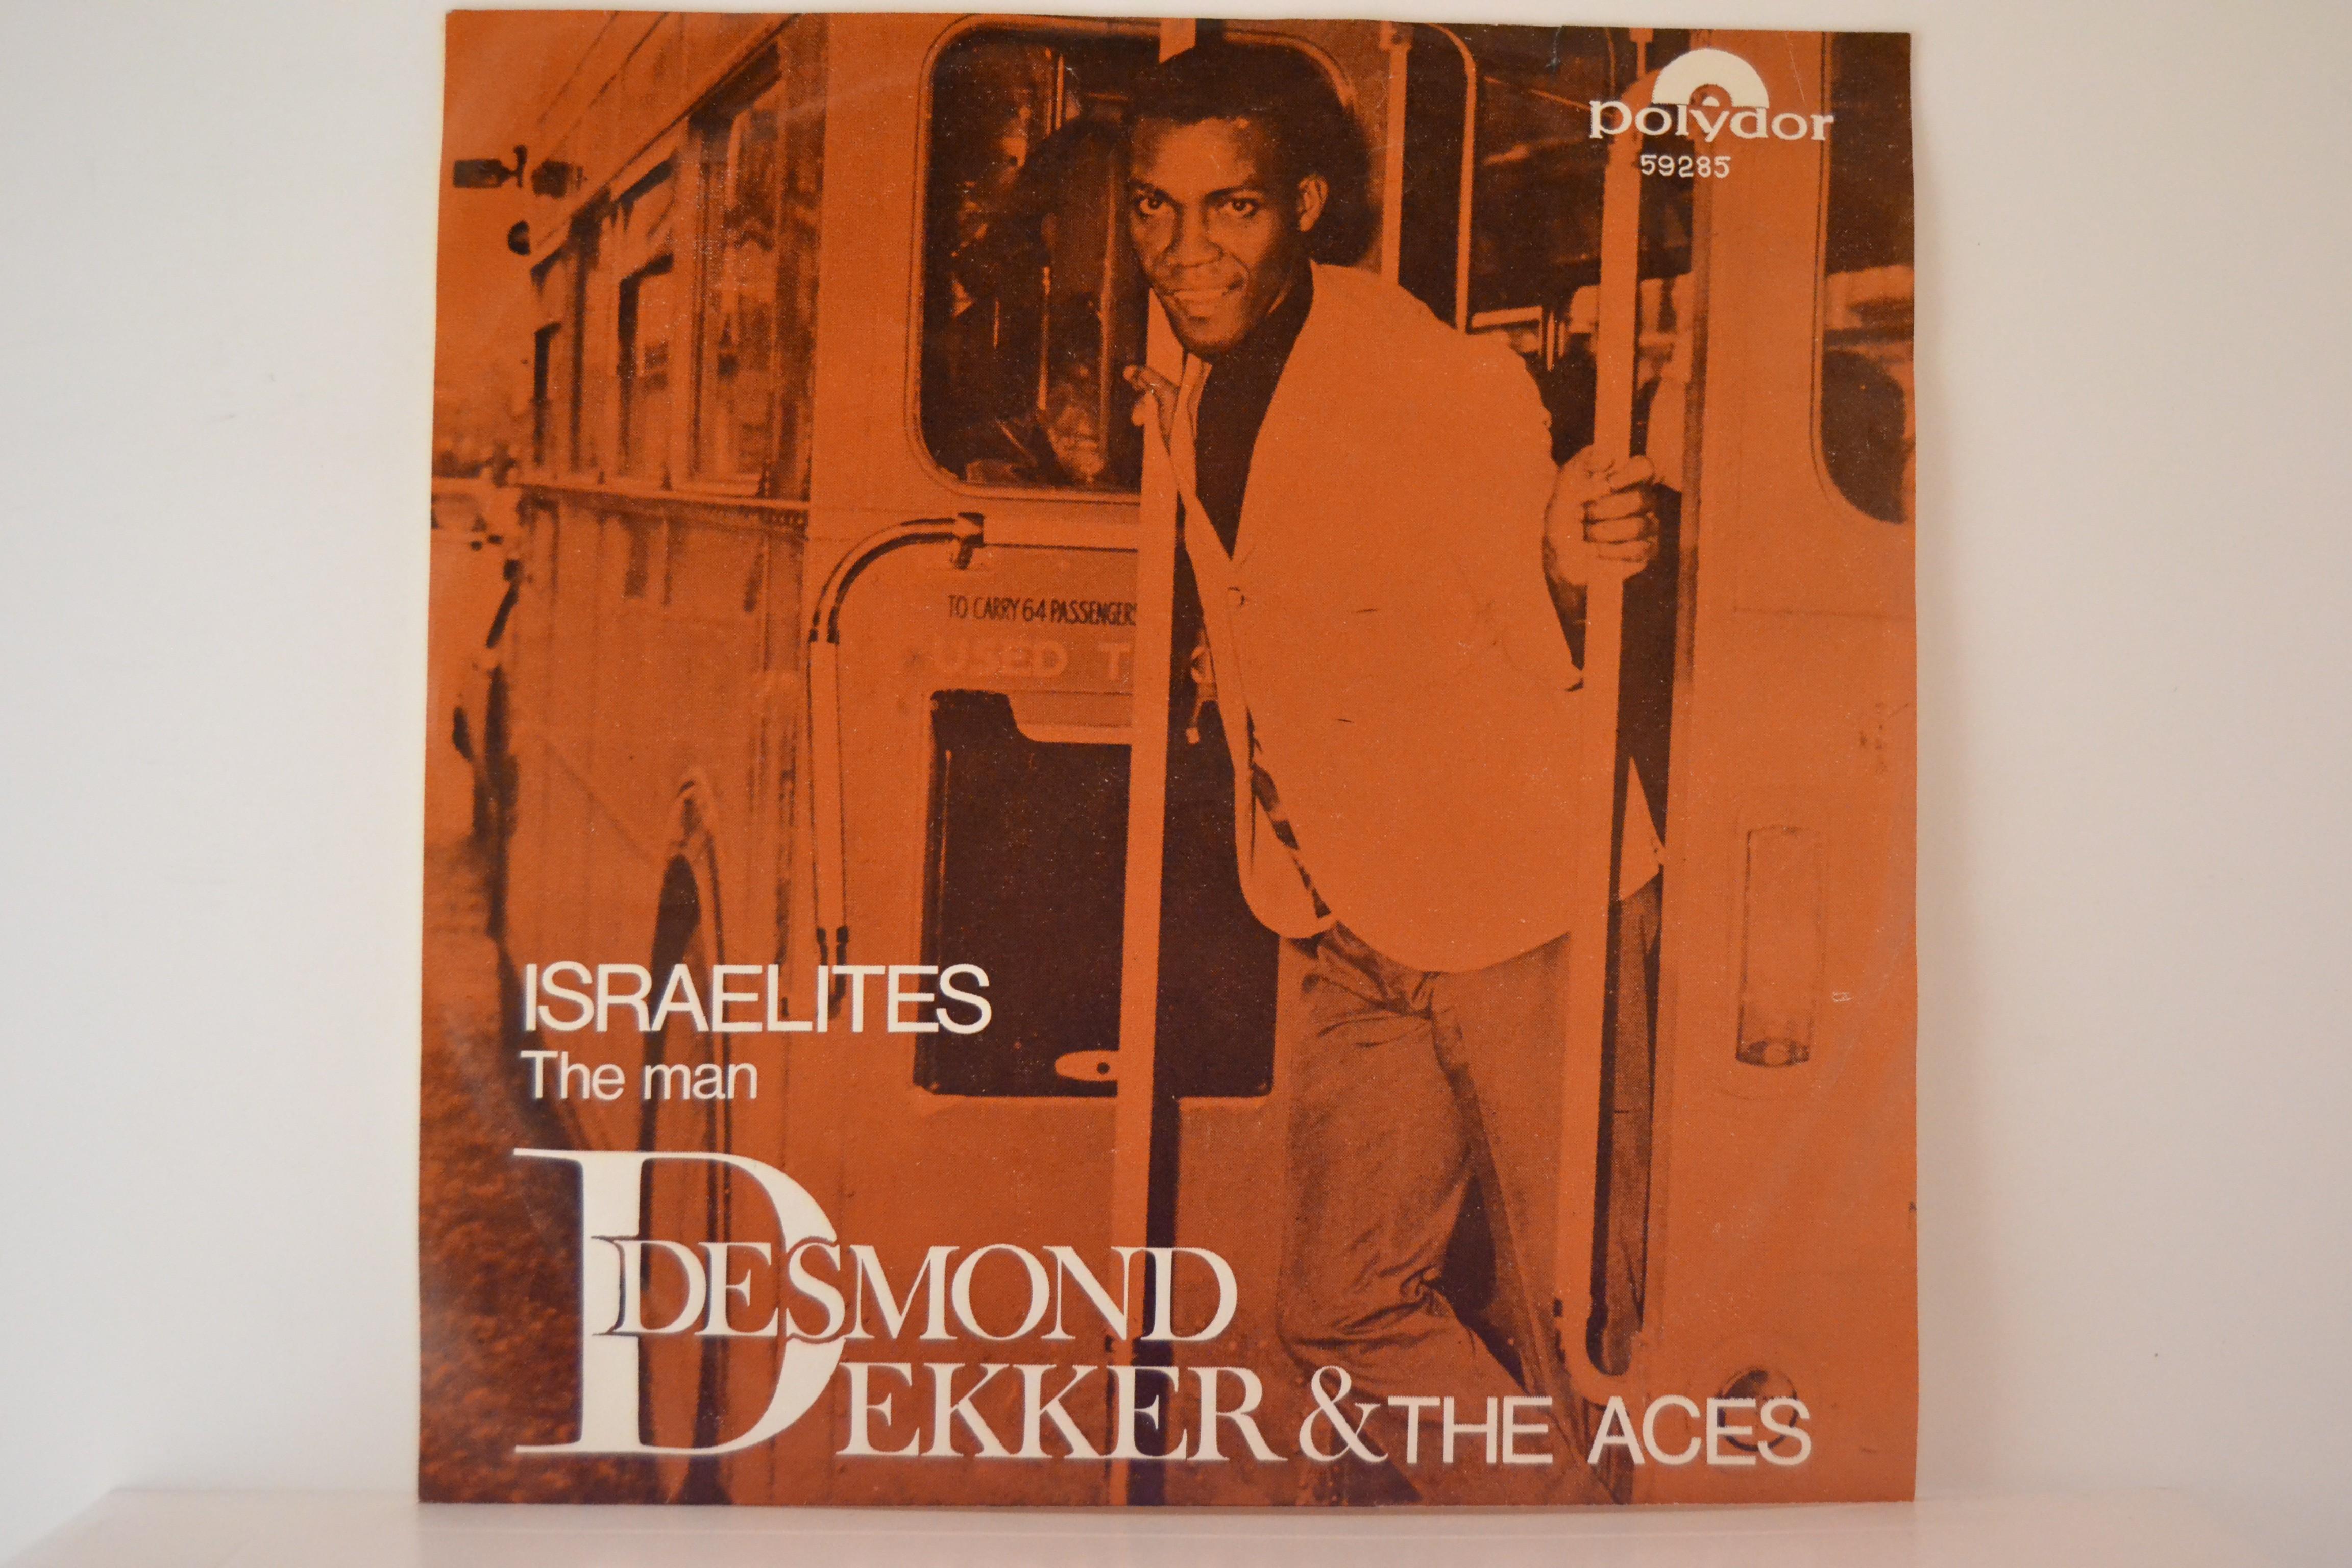 DESMOND DEKKER & THE ACES : Israelites / The man